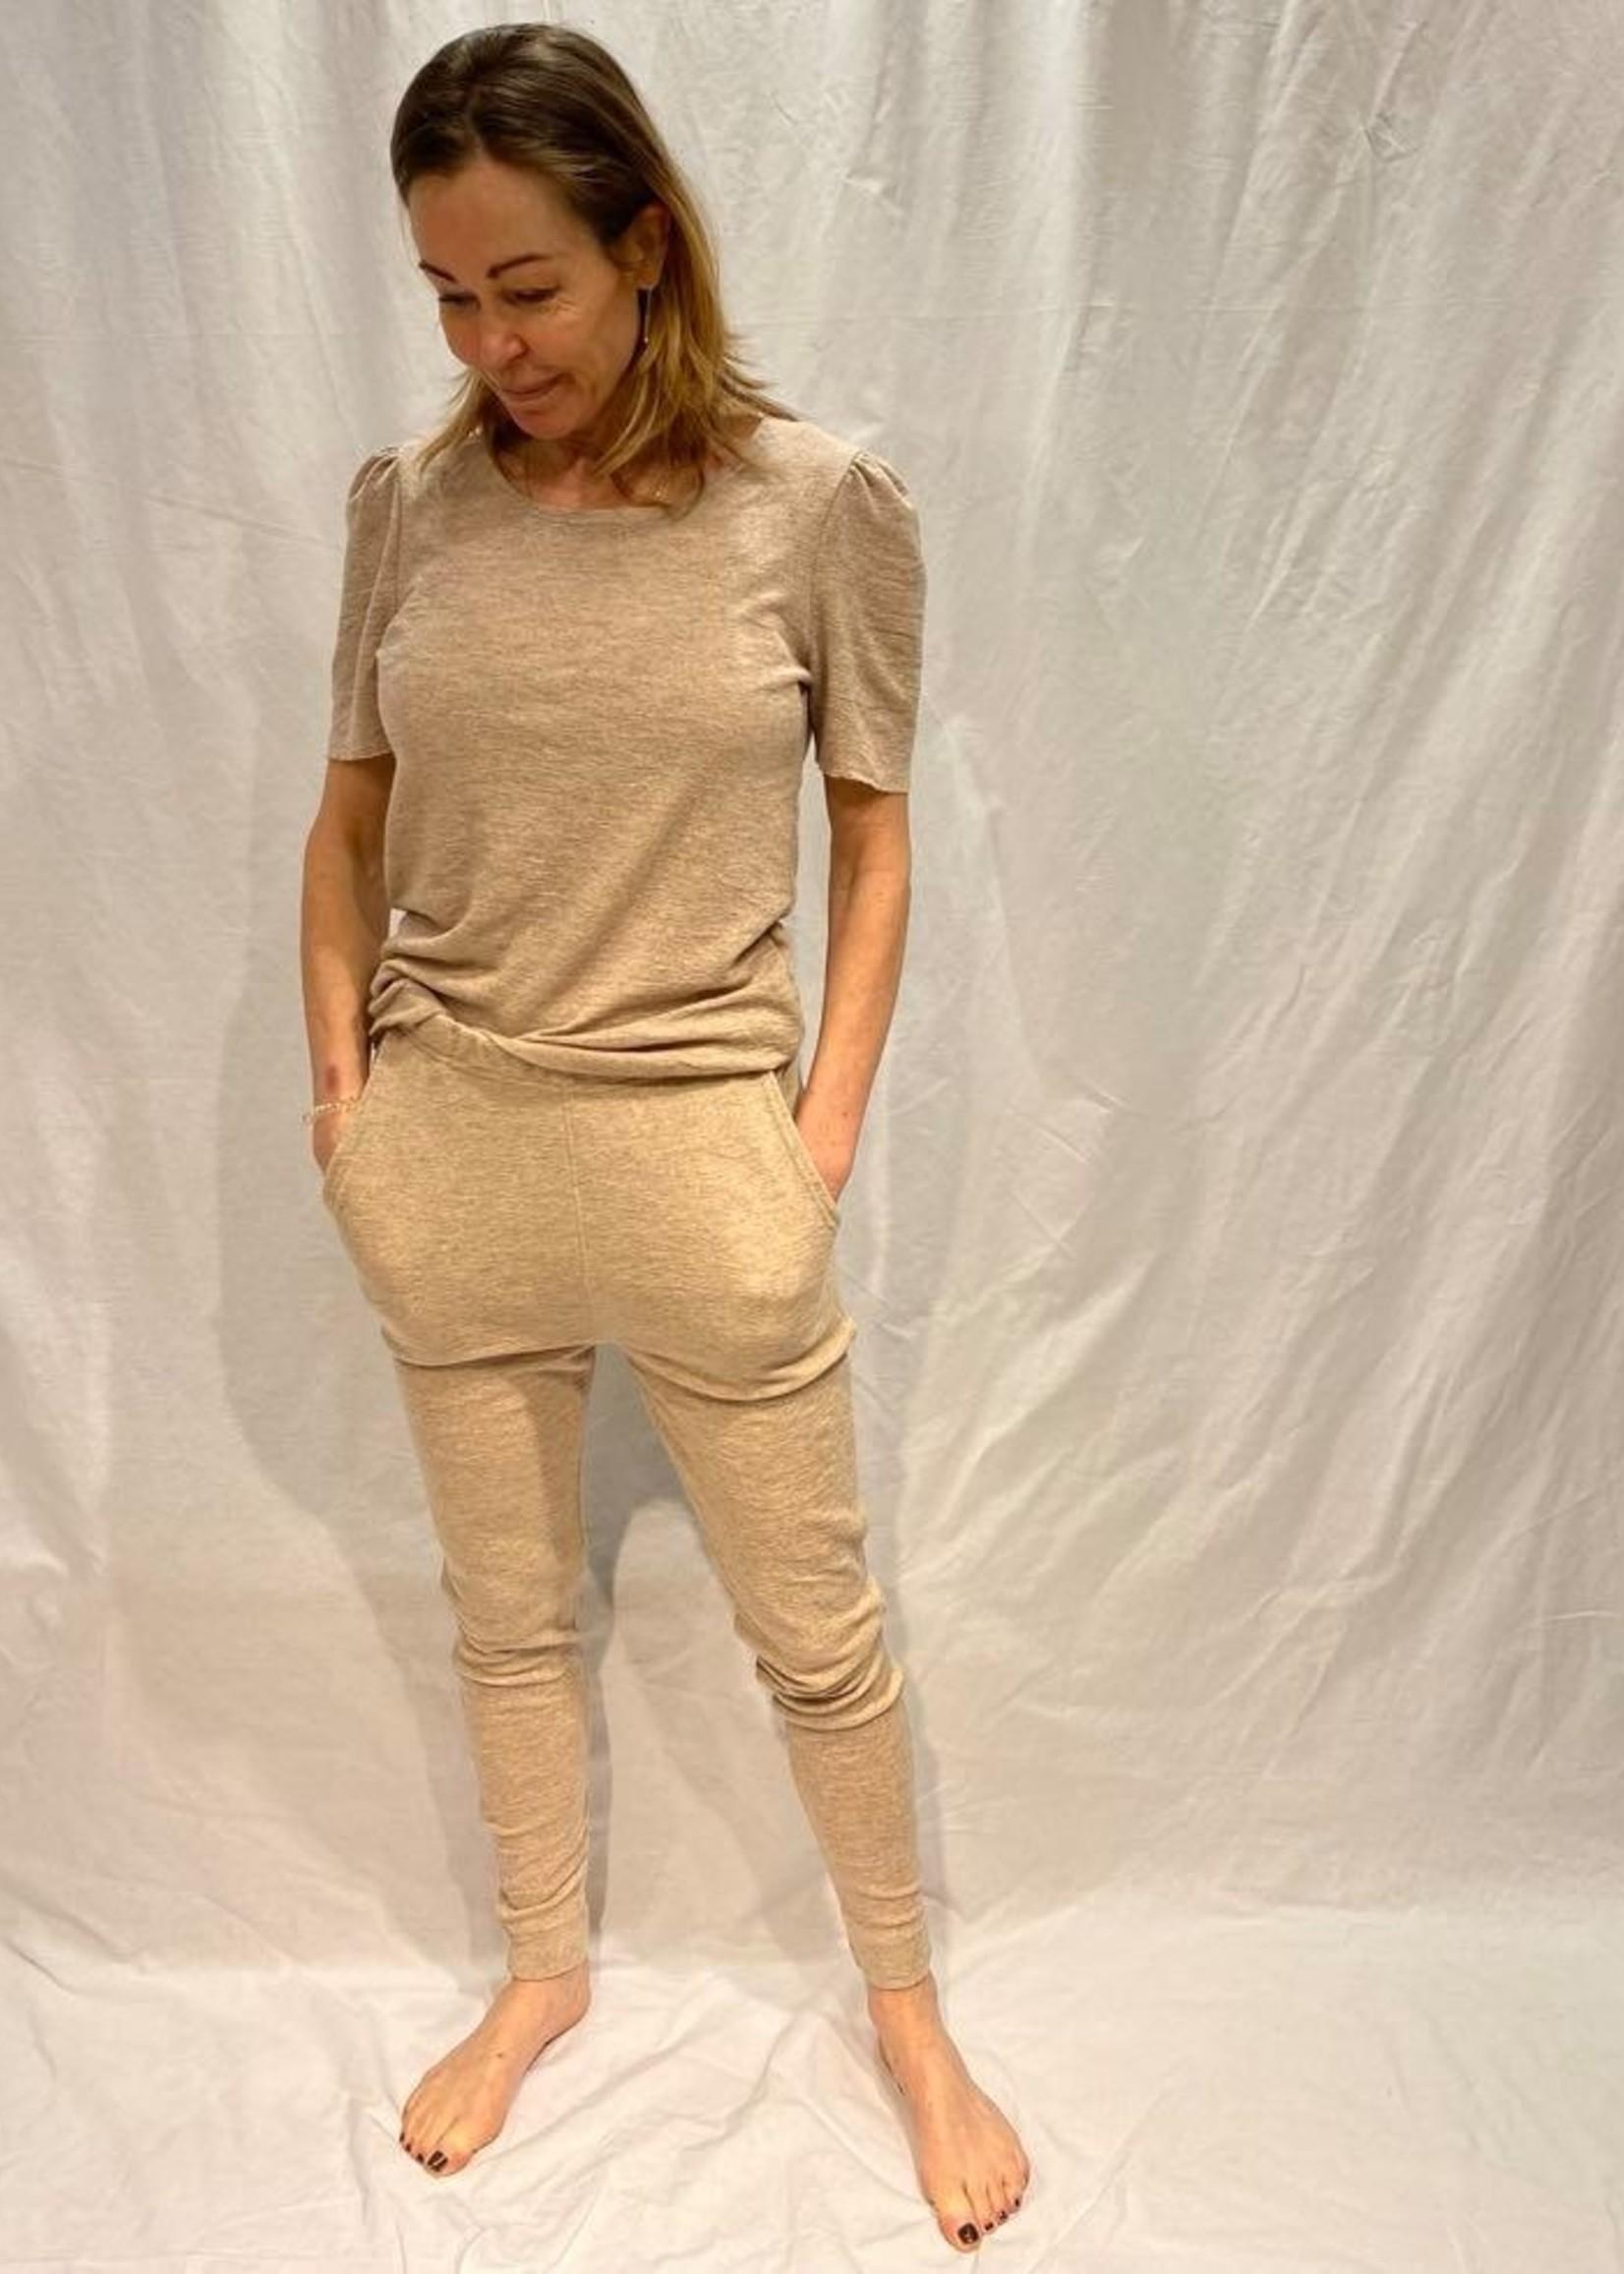 by basics by basics tee short sleeve puff sand melange L